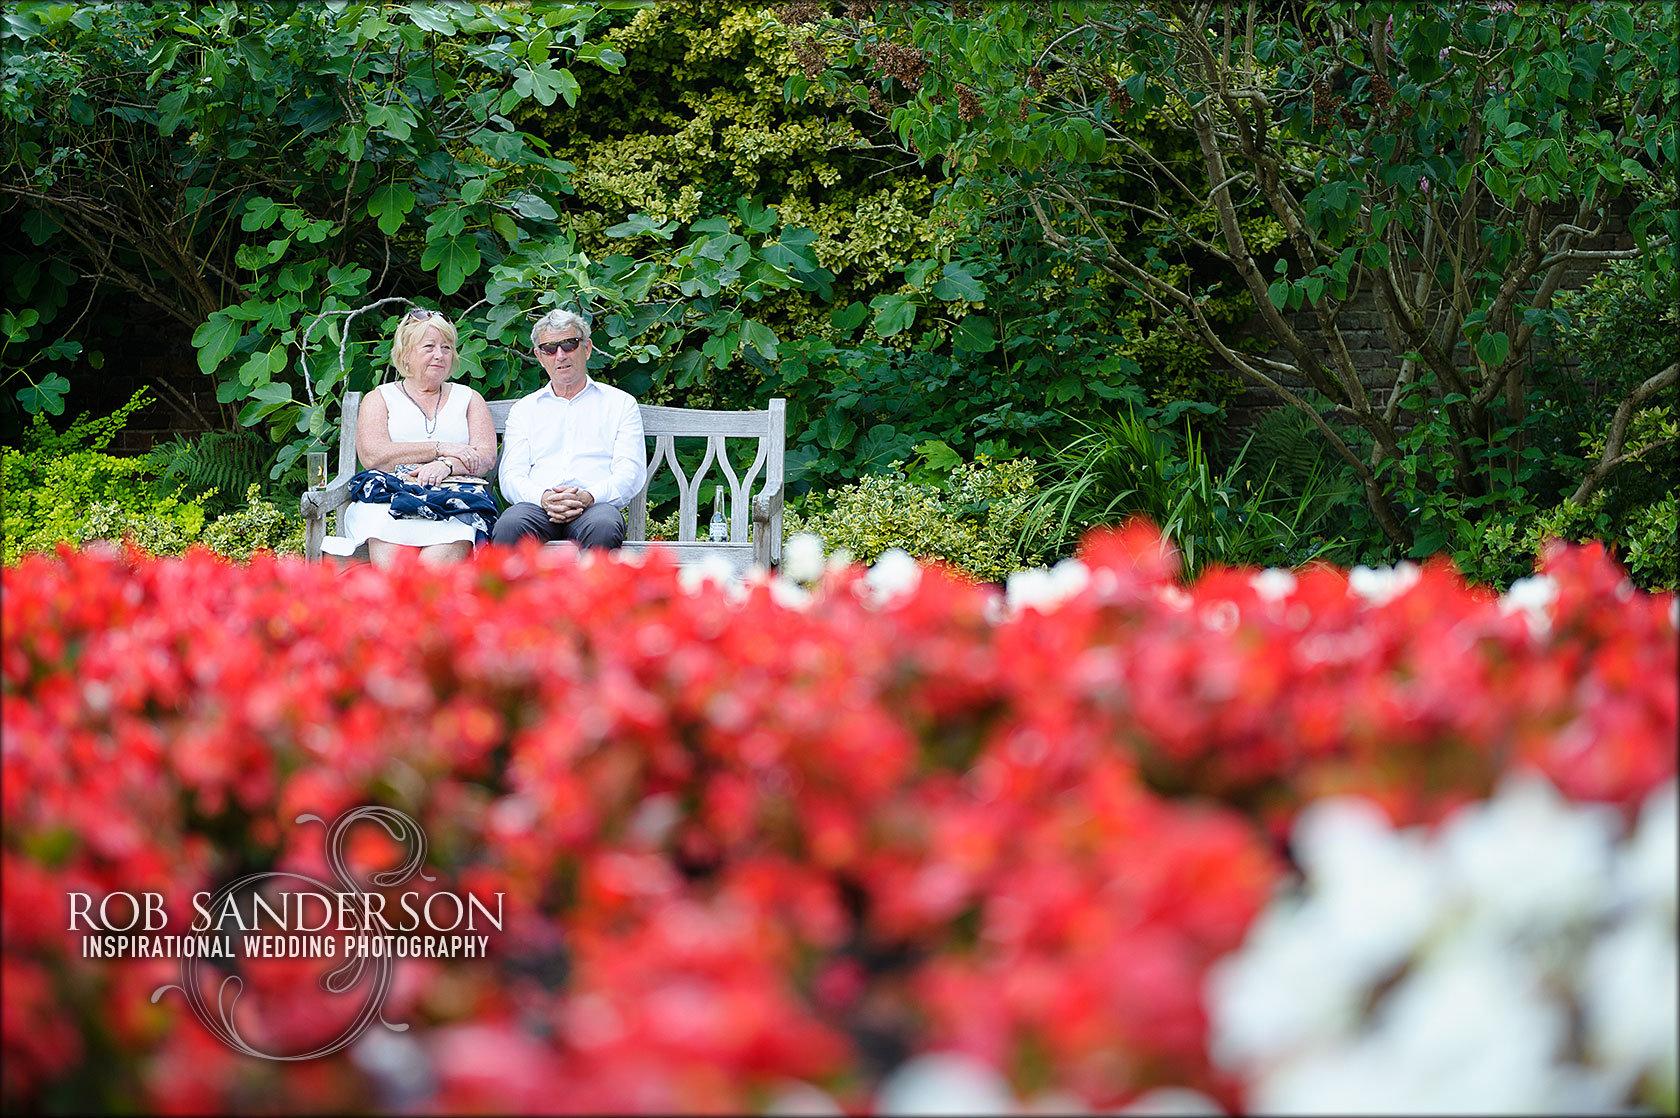 Guests enjoy Soughton Hall's beautiful gardens